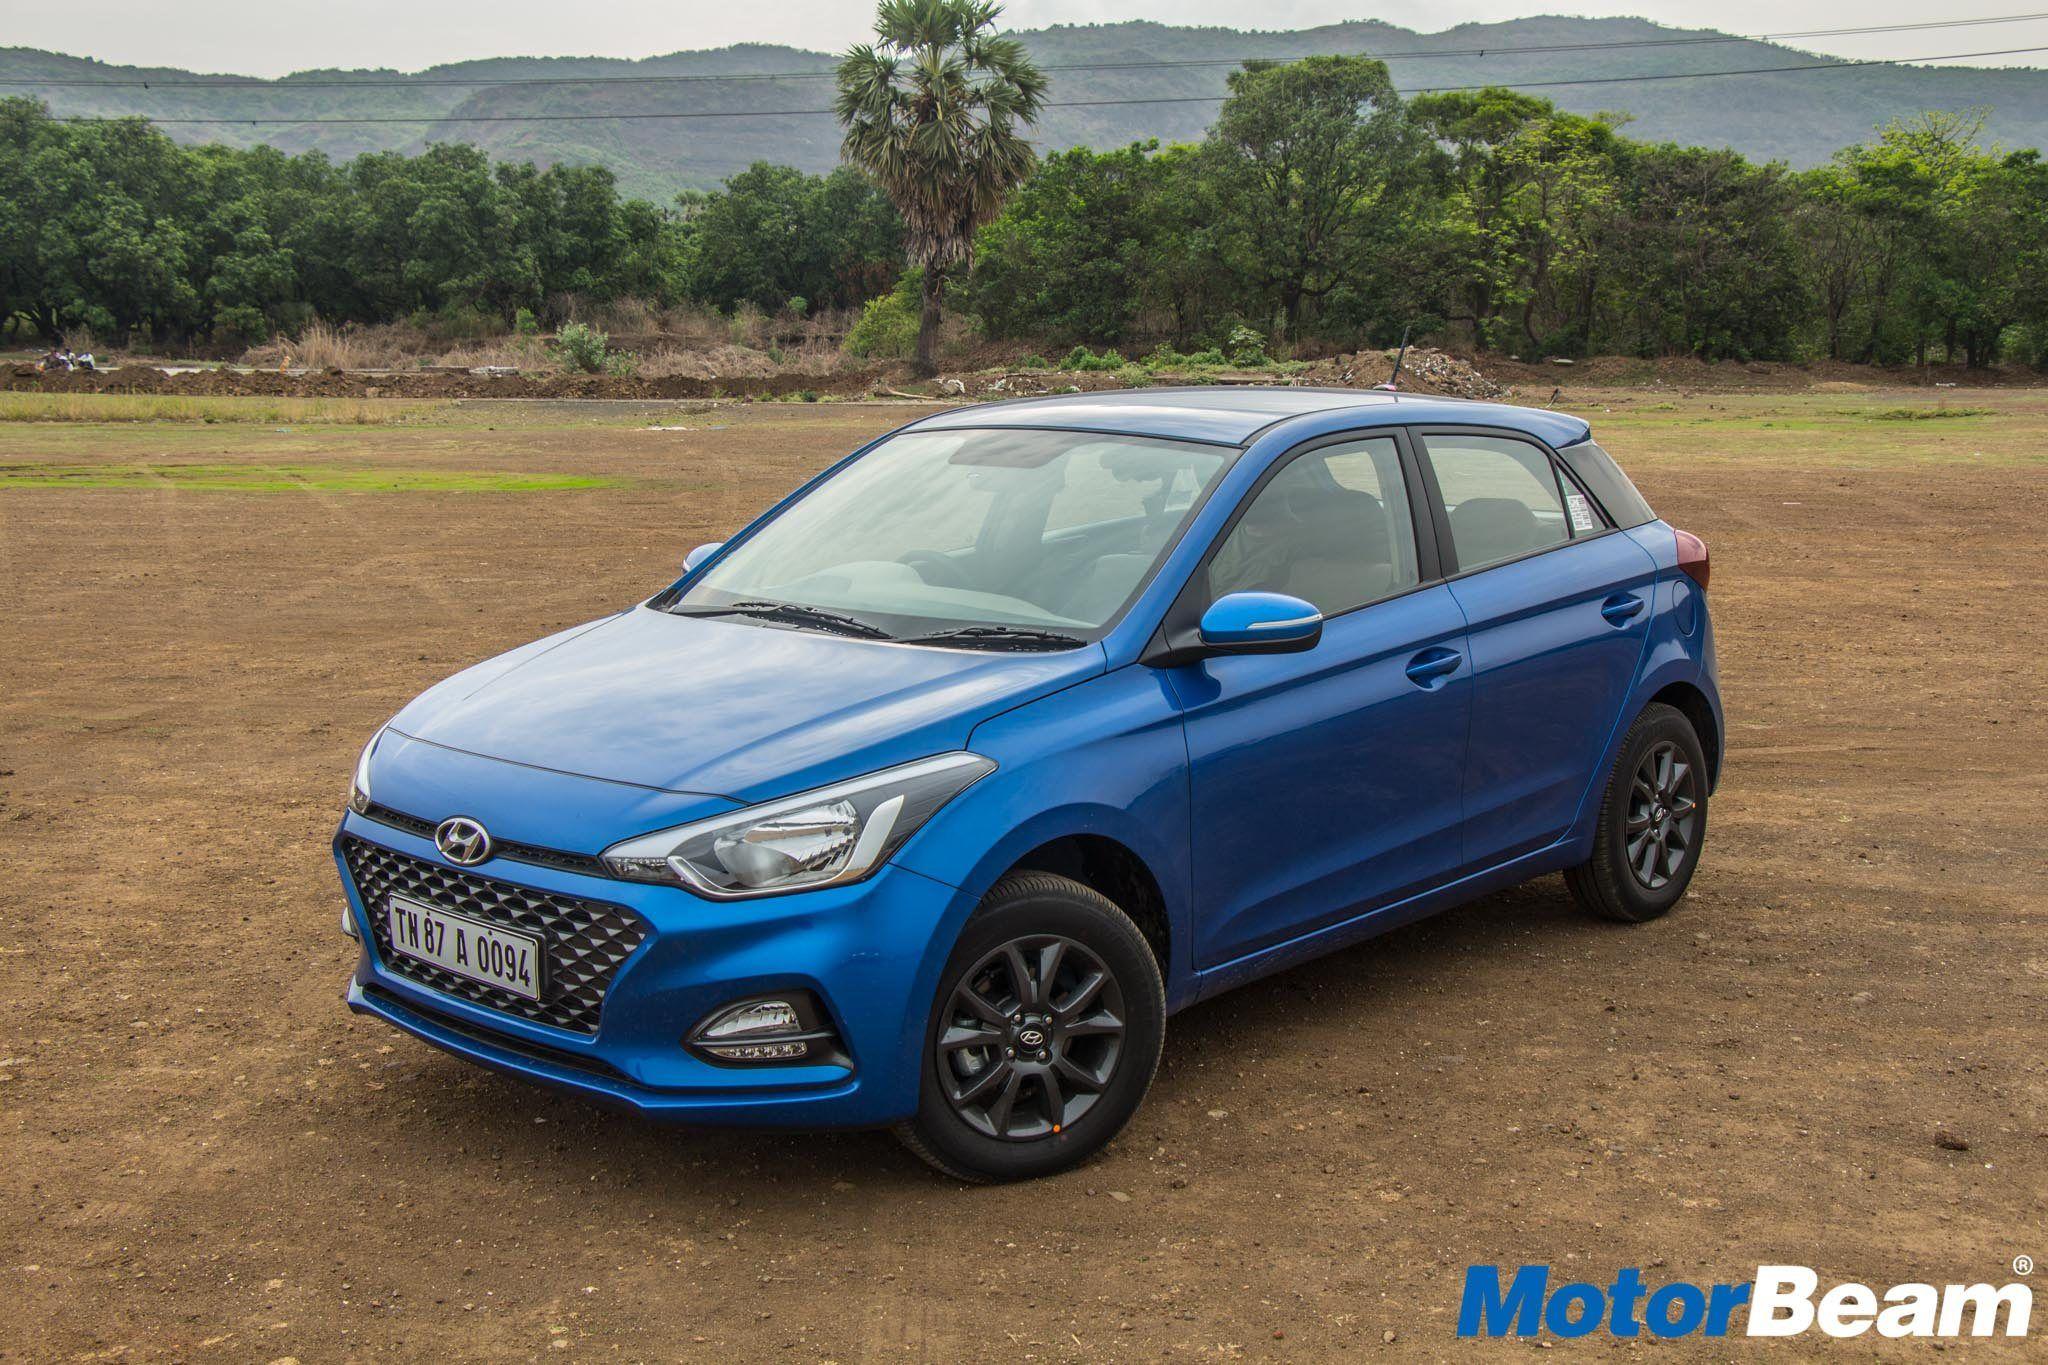 2020 Hyundai I20 Specs And Review In 2020 Hyundai New Hyundai Kia Rio